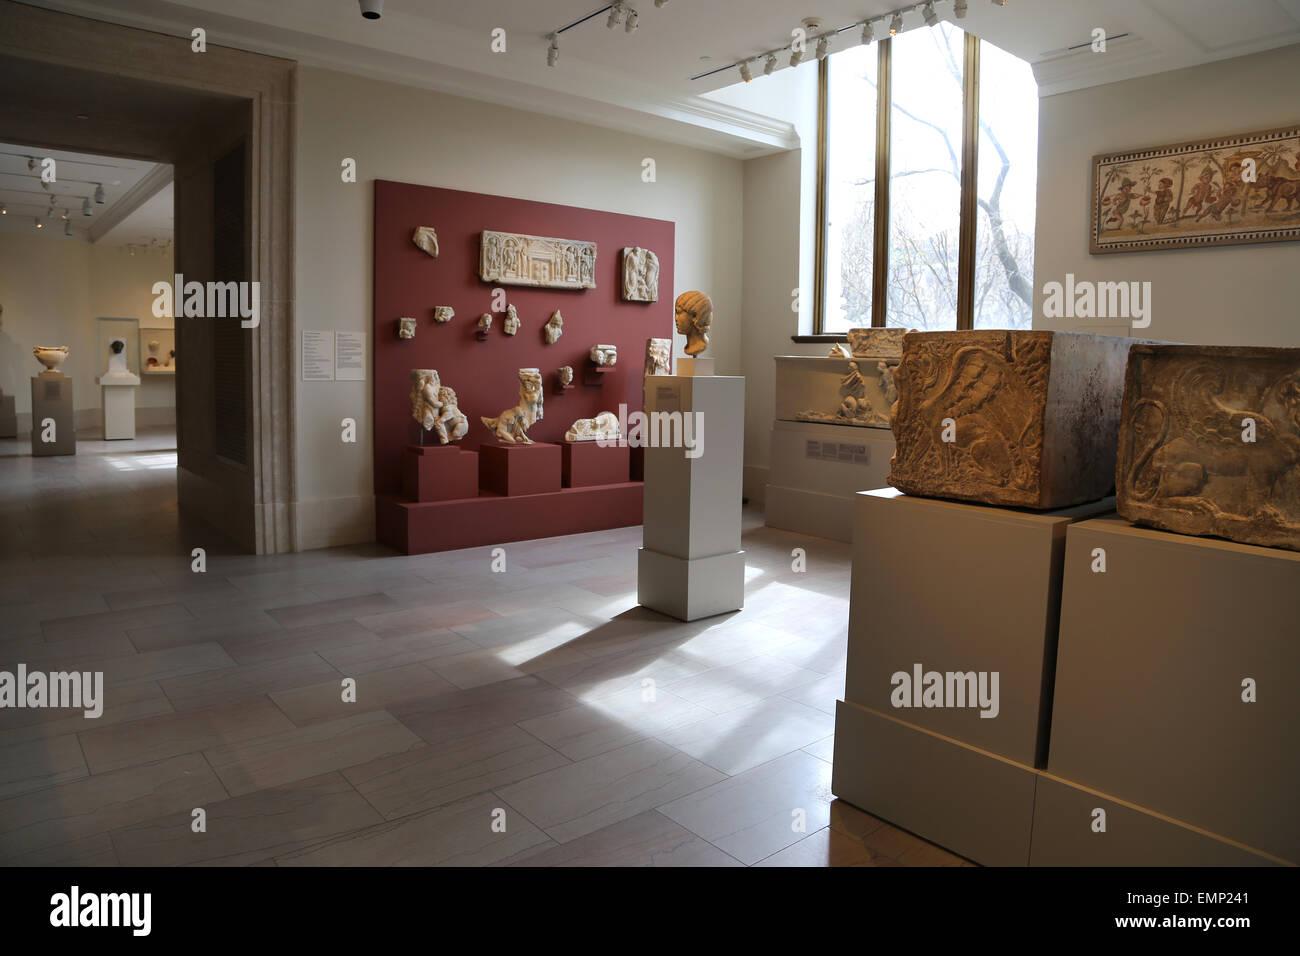 USA. New York city. Metropolitan Museum of Art. Inside. Roman Room. - Stock Image